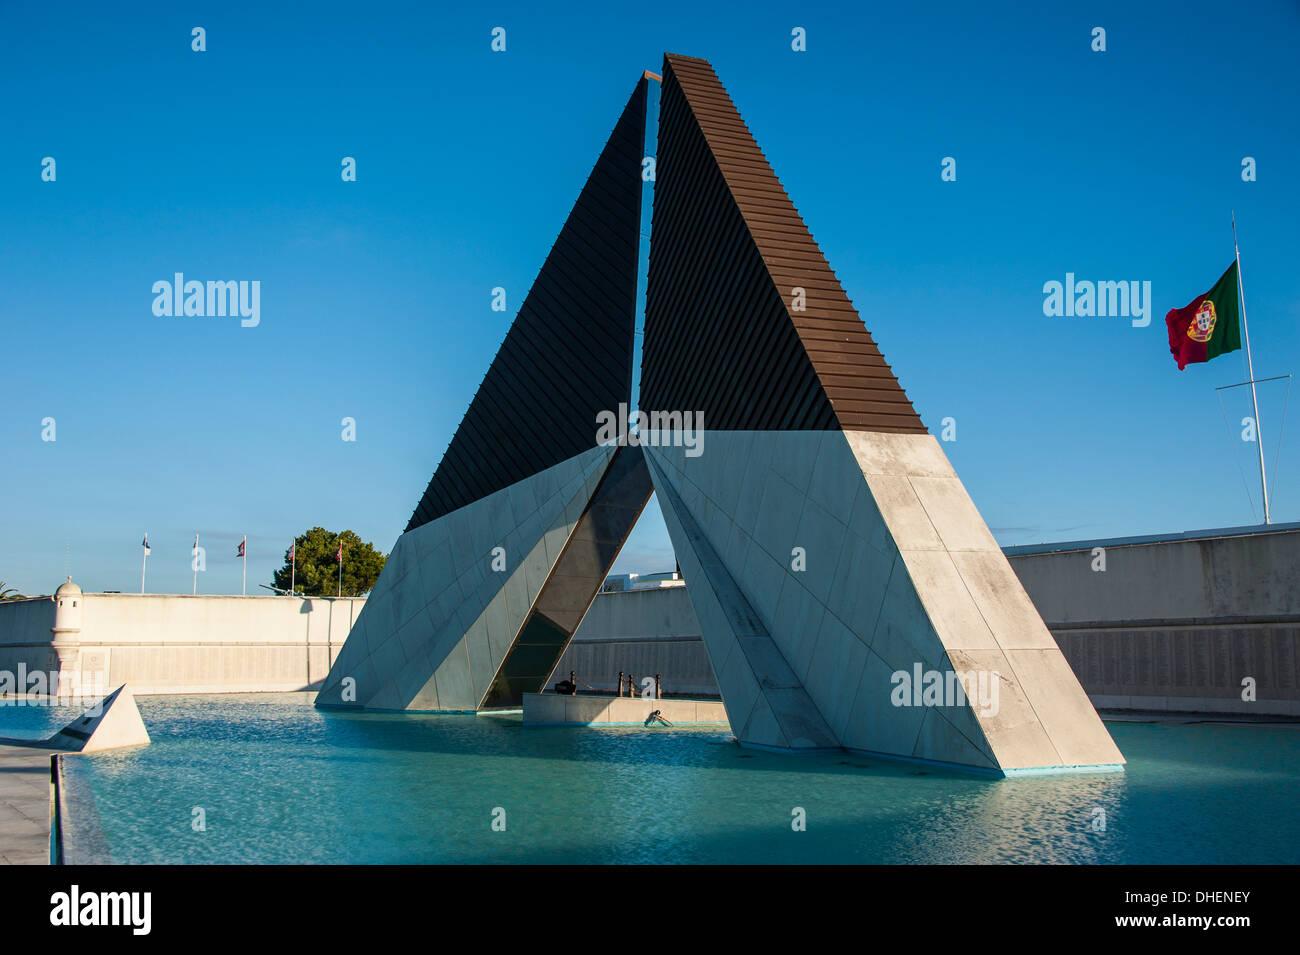 Monumento aos Combatentes do Ultramar, Belem, Lisbona, Portogallo, Europa Immagini Stock